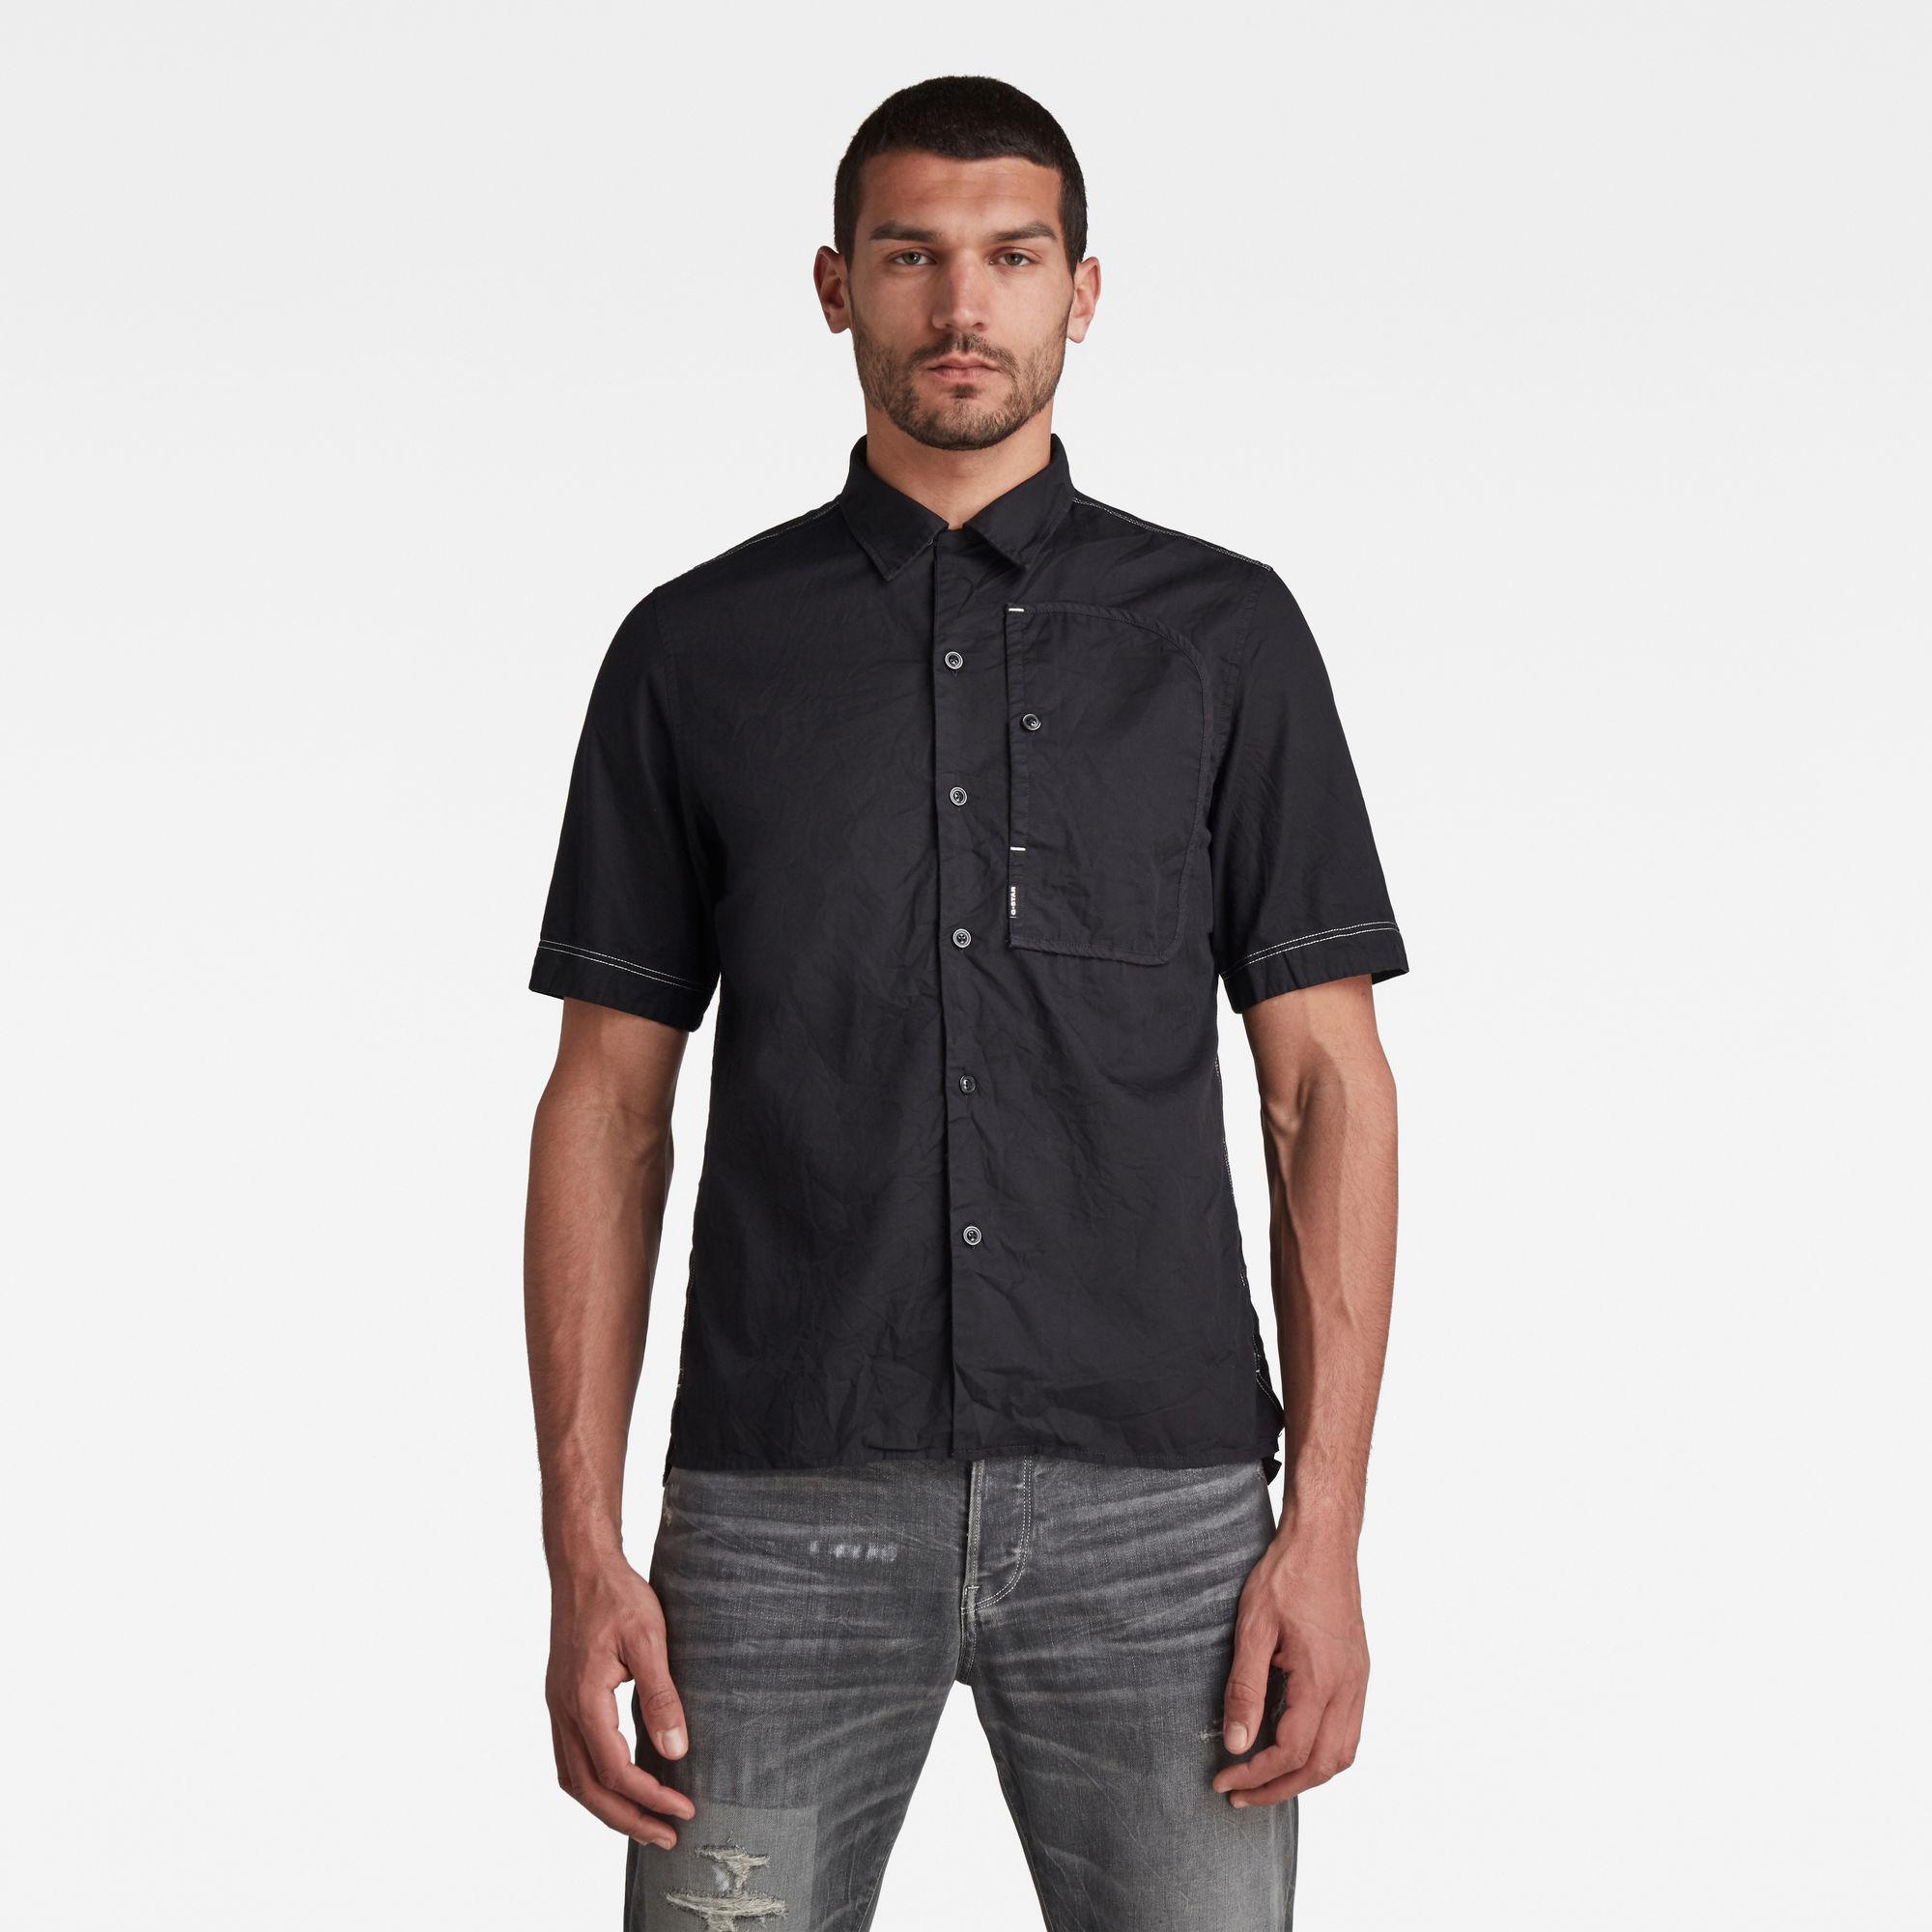 G-Star RAW Heren Bound Pocket Regular Shirt Zwart